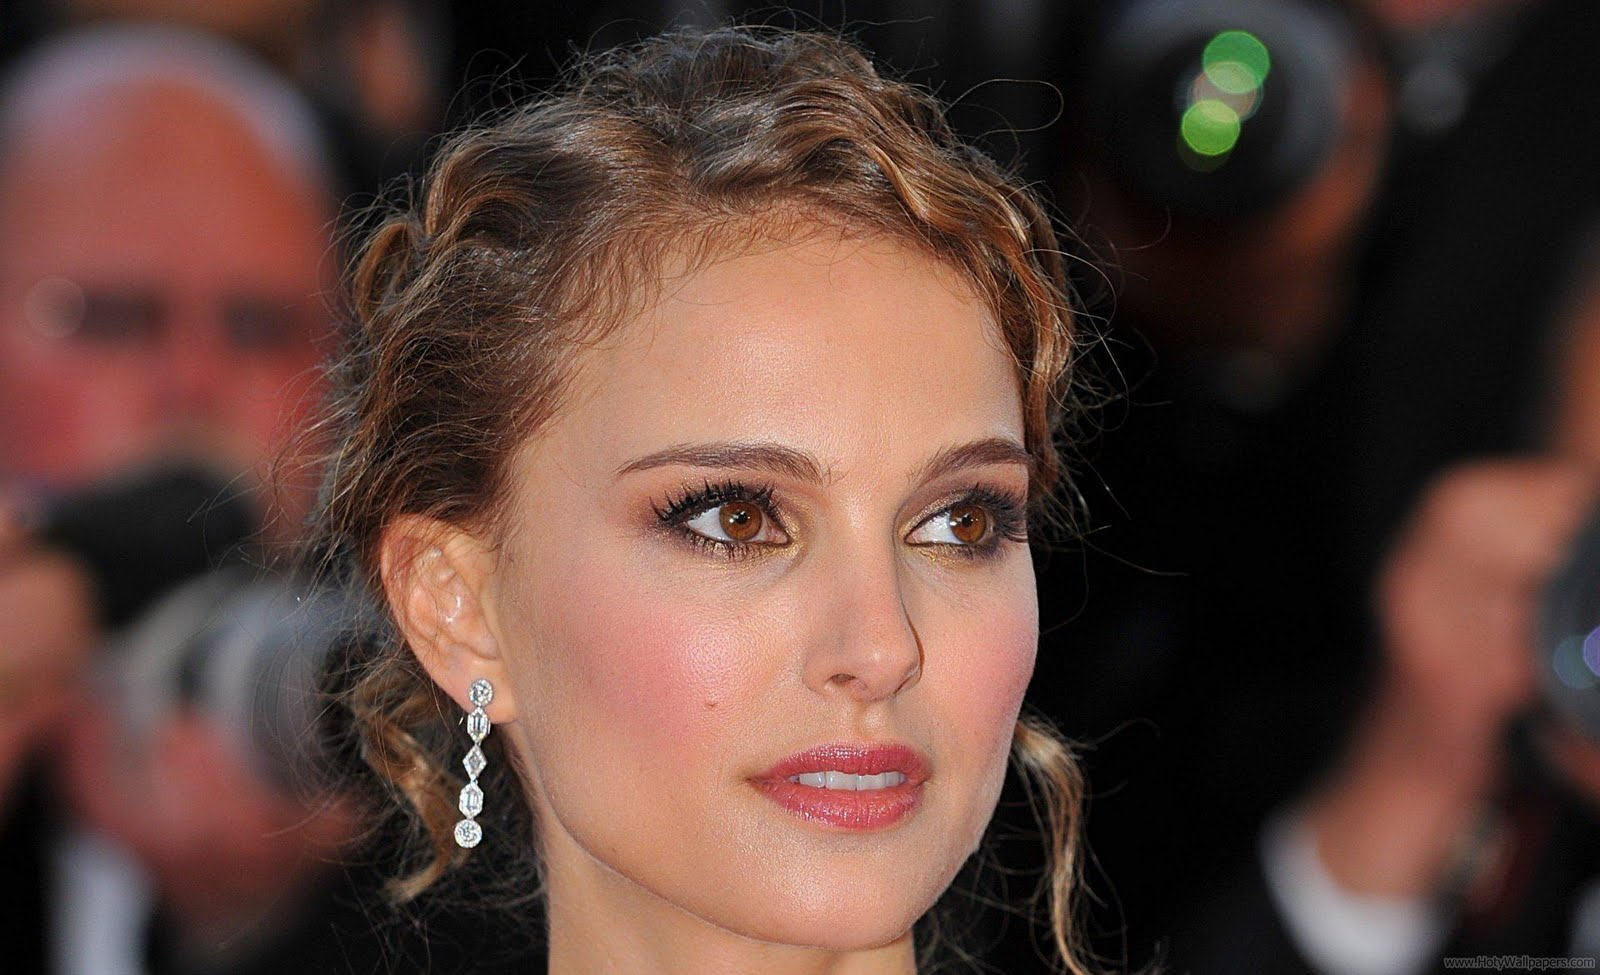 http://1.bp.blogspot.com/-oOksuXL9KOo/TrT2M7Gjs3I/AAAAAAAAOic/VMg8uuvCksI/s1600/israeli_american_actress_natalie_portman_latest_wallpaper.jpg